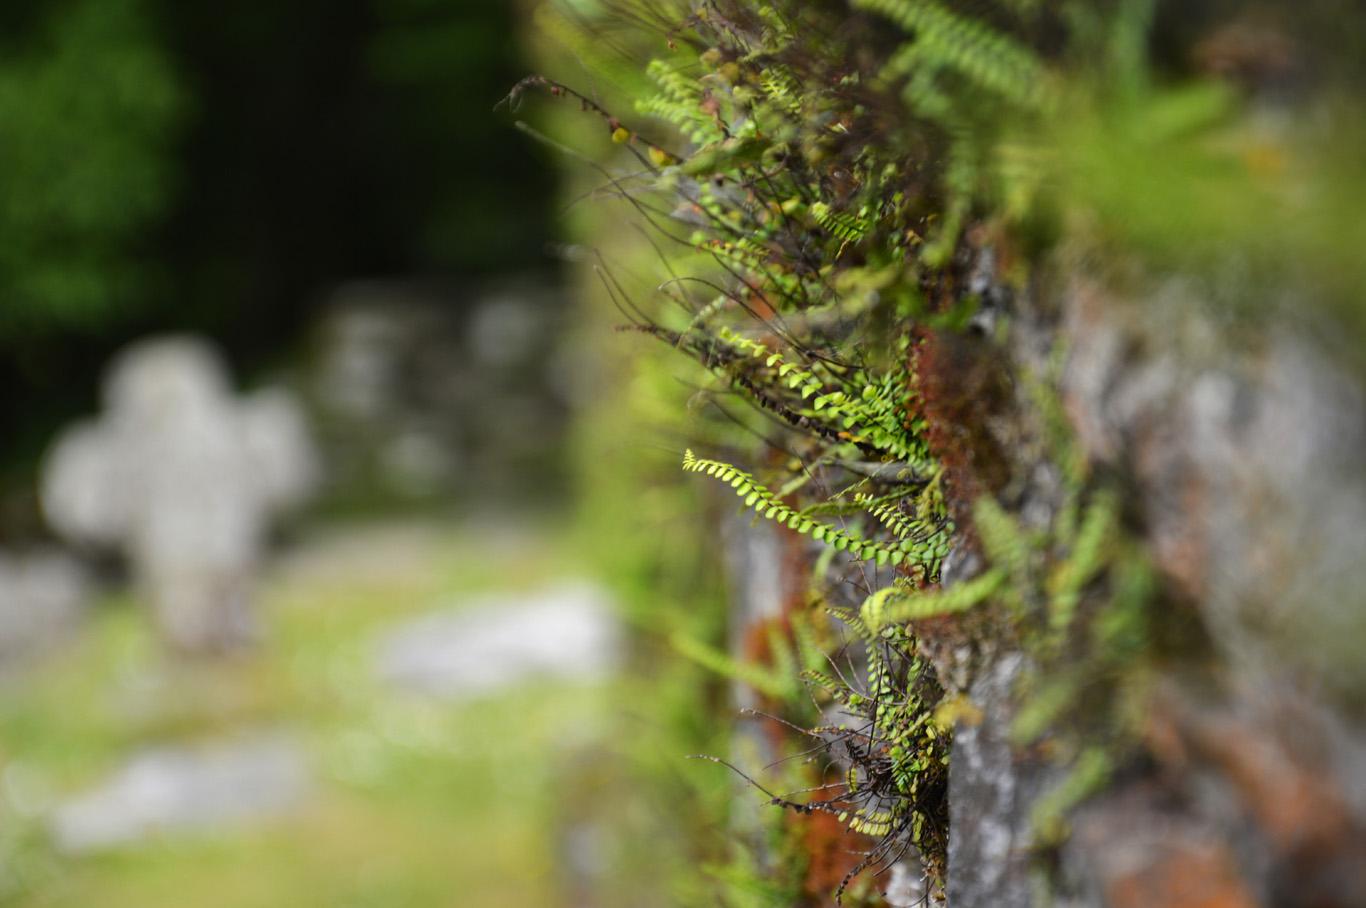 Ferns on the walls of Reefert church